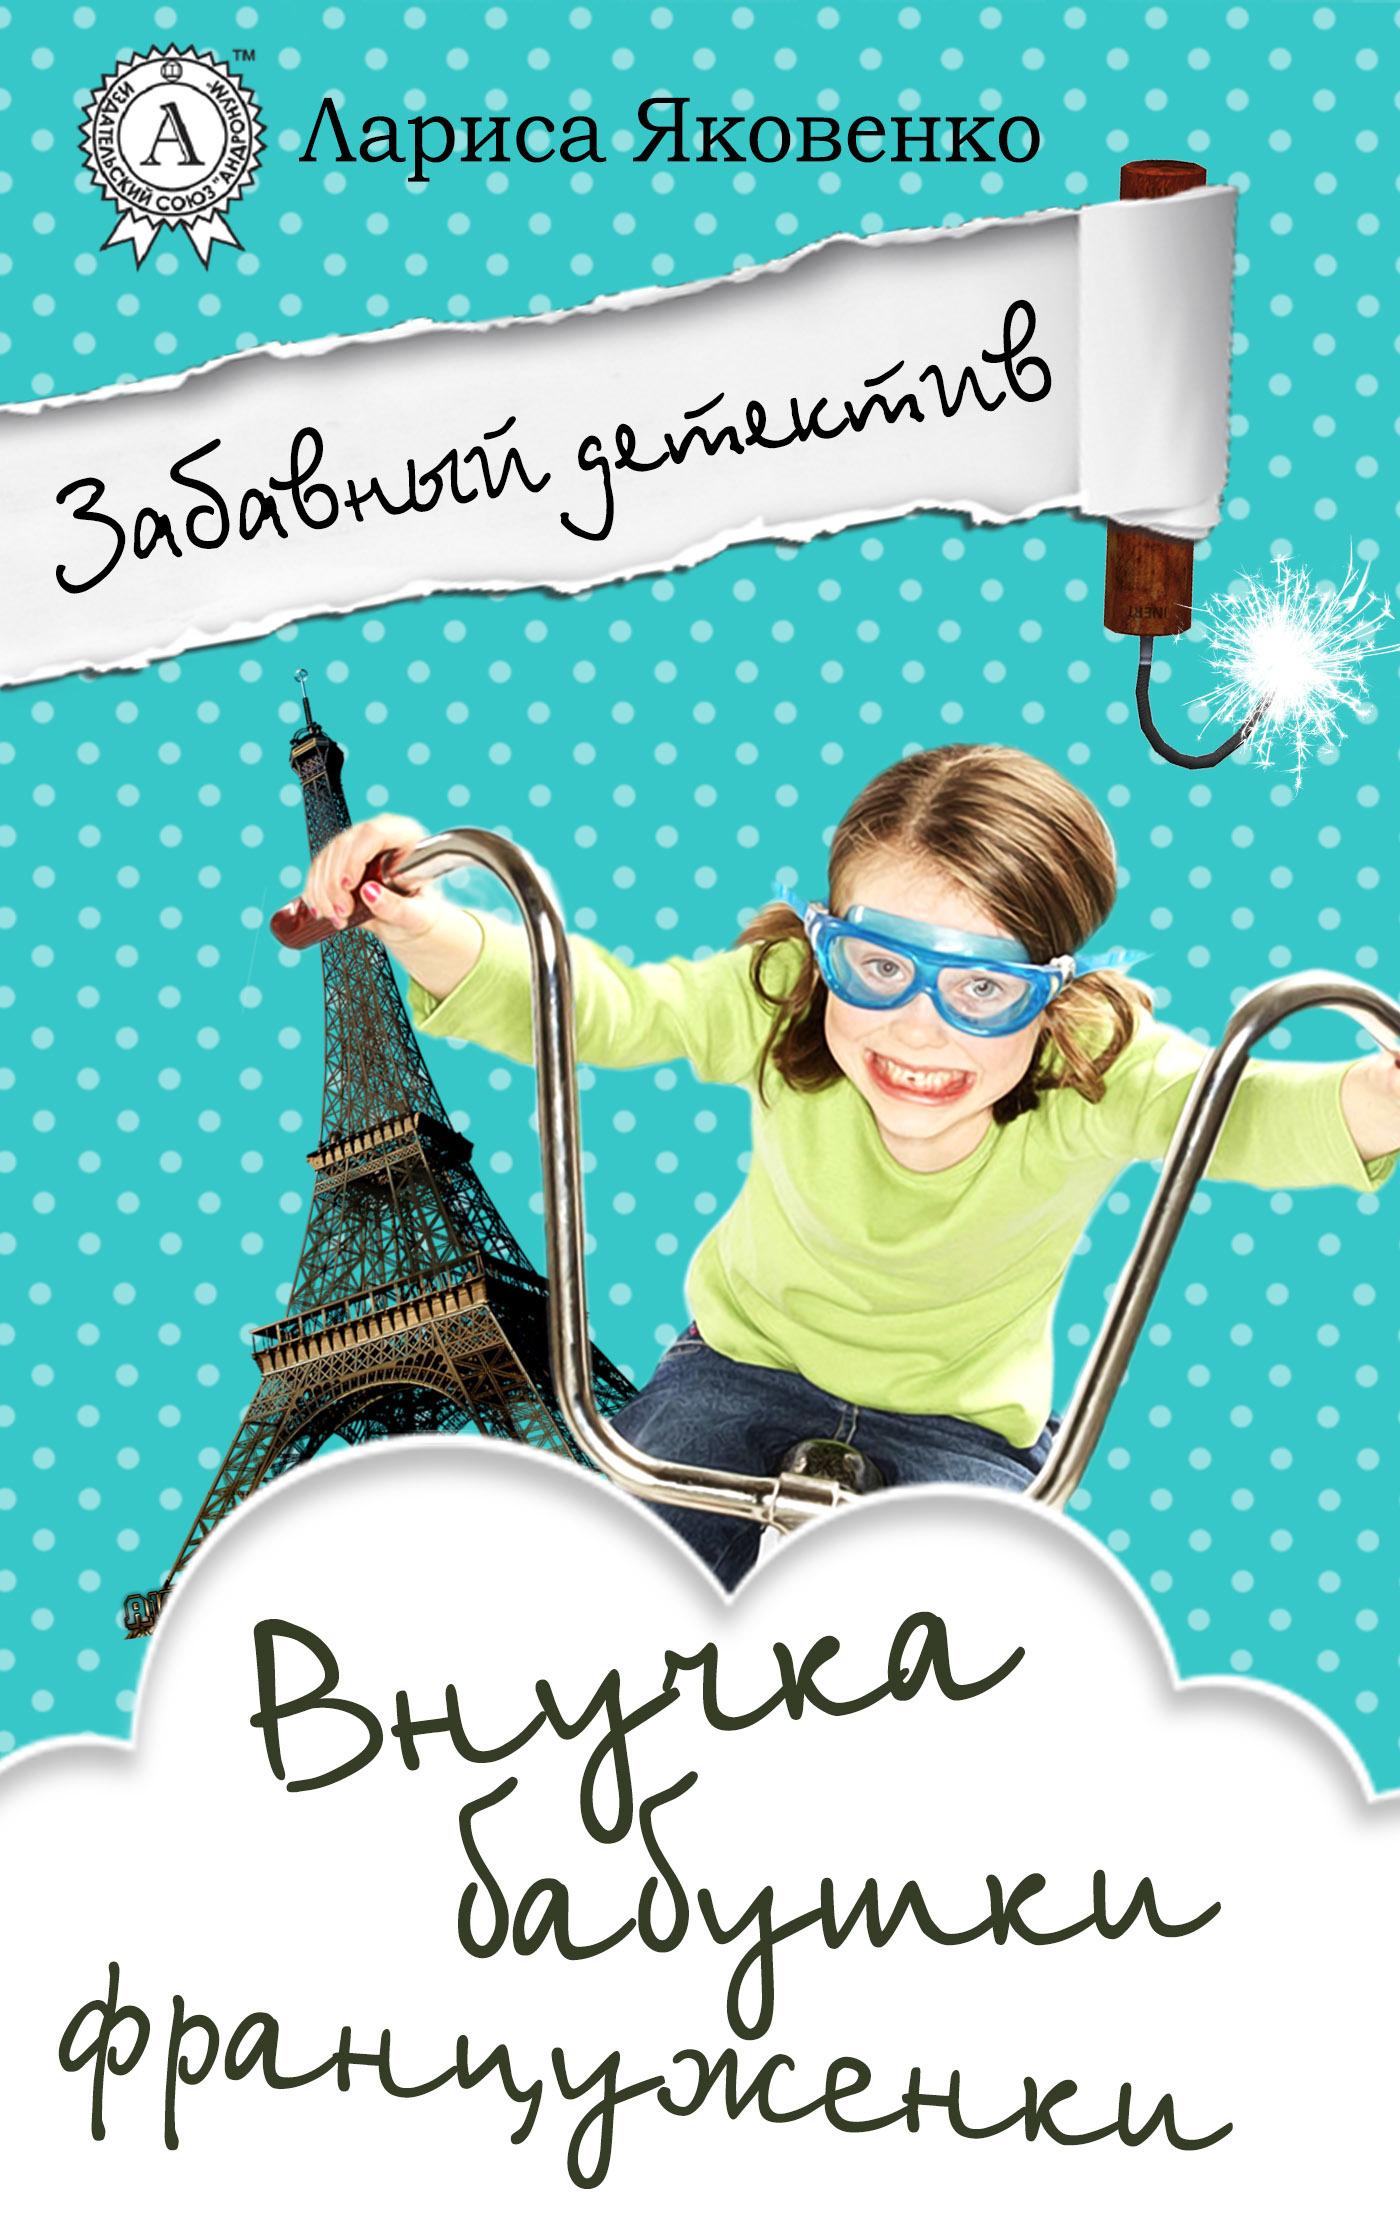 Внучка бабушки француженки